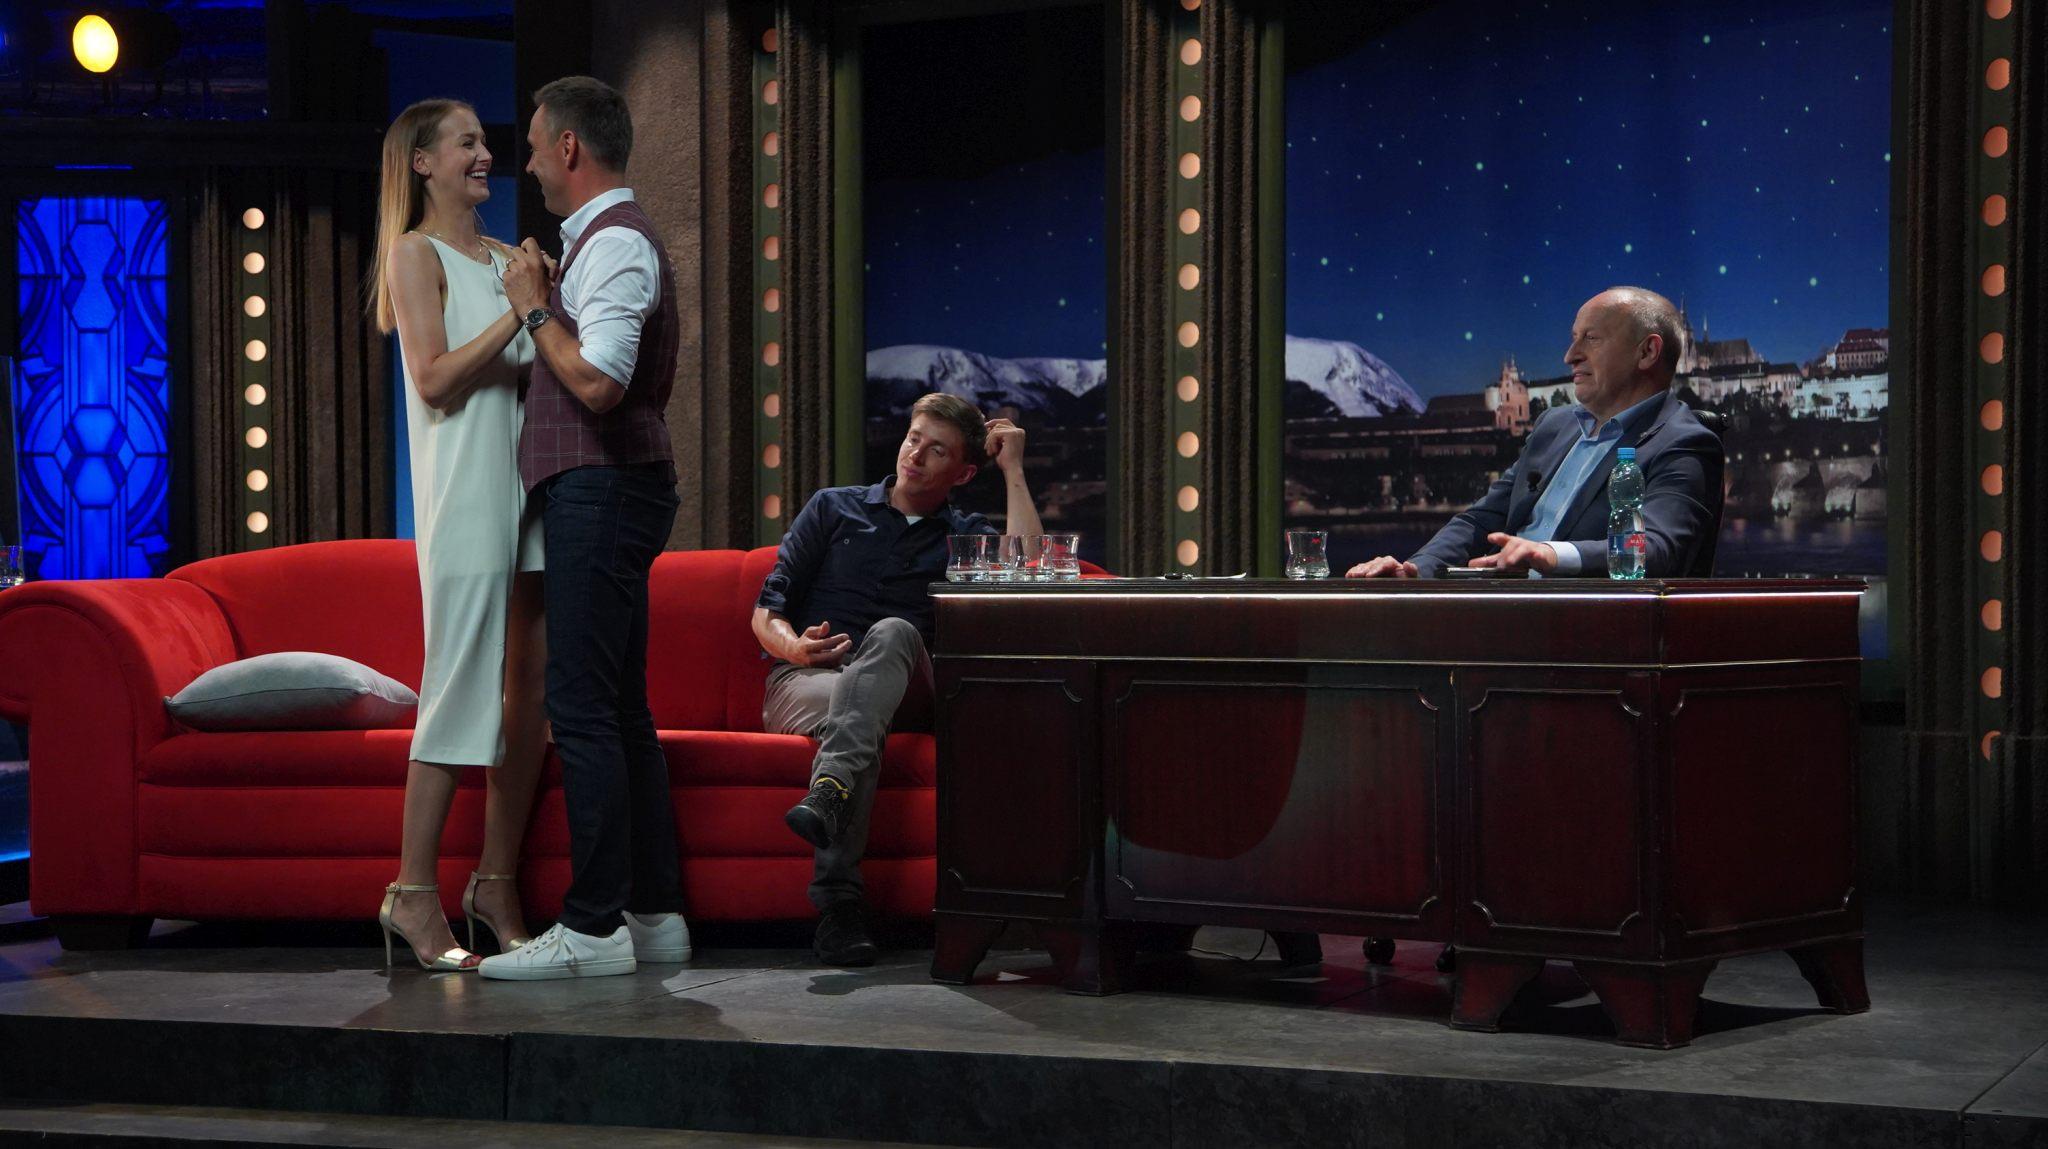 Herci, manželé Roman a Petra Vojtkovi tančí spontánně na melodie dechovky Františka Skály, v pozadí horolezec Radoslav Groh, v SJK 23. 6. 2021